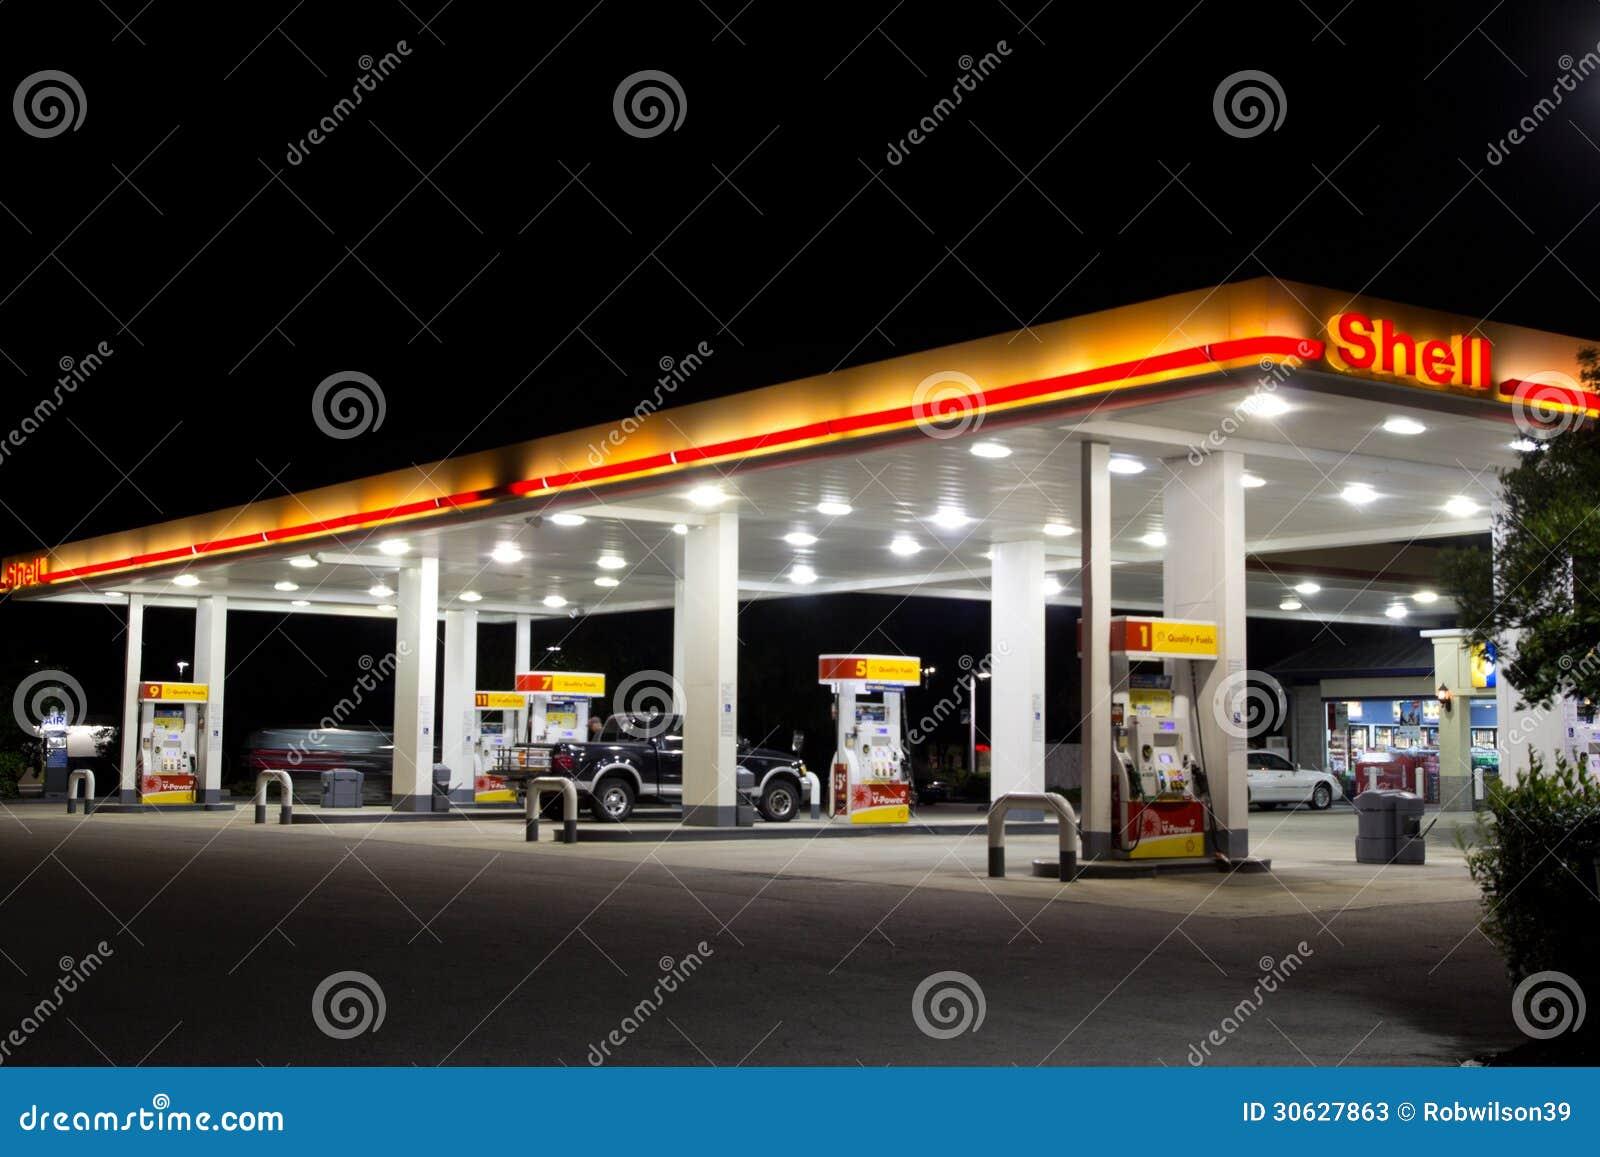 Shell station locator